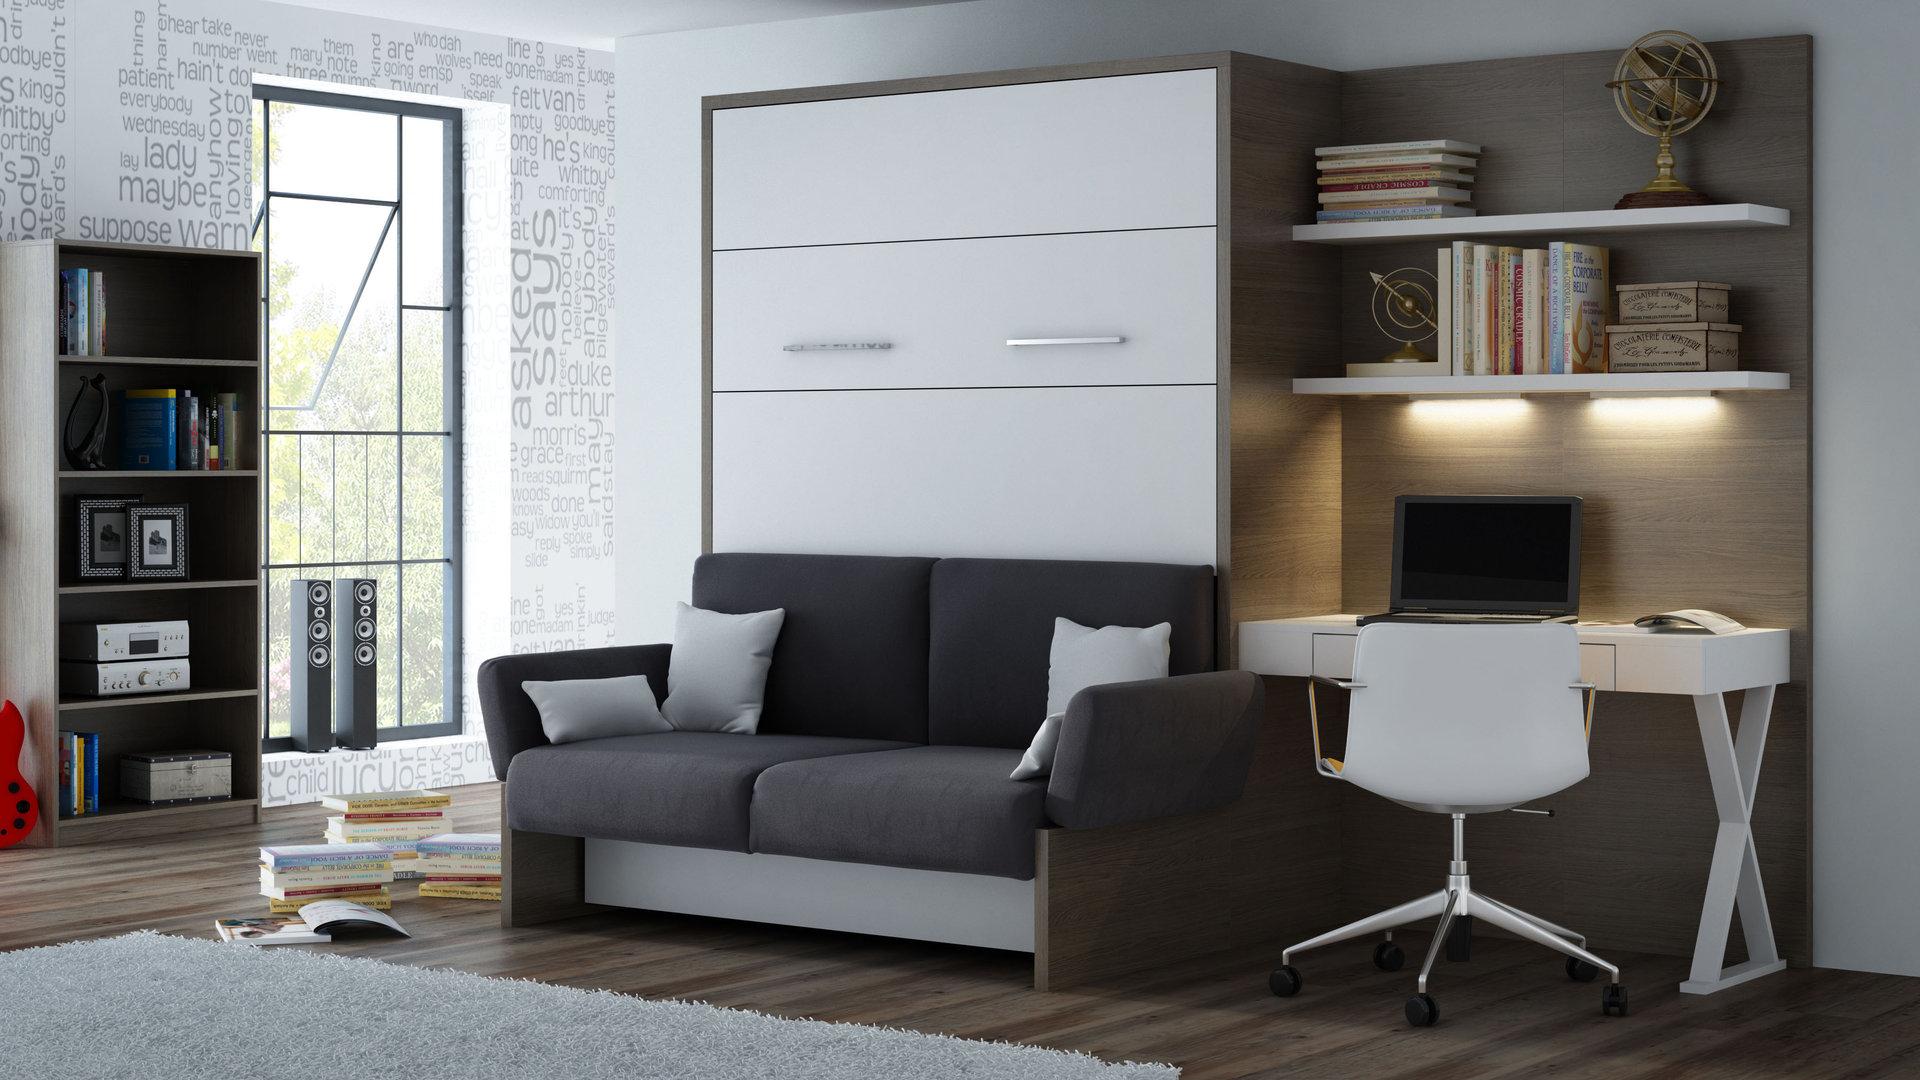 wandbett mit sofa wbs 1 soft office 140 x 200 cm eiche anthrazit. Black Bedroom Furniture Sets. Home Design Ideas